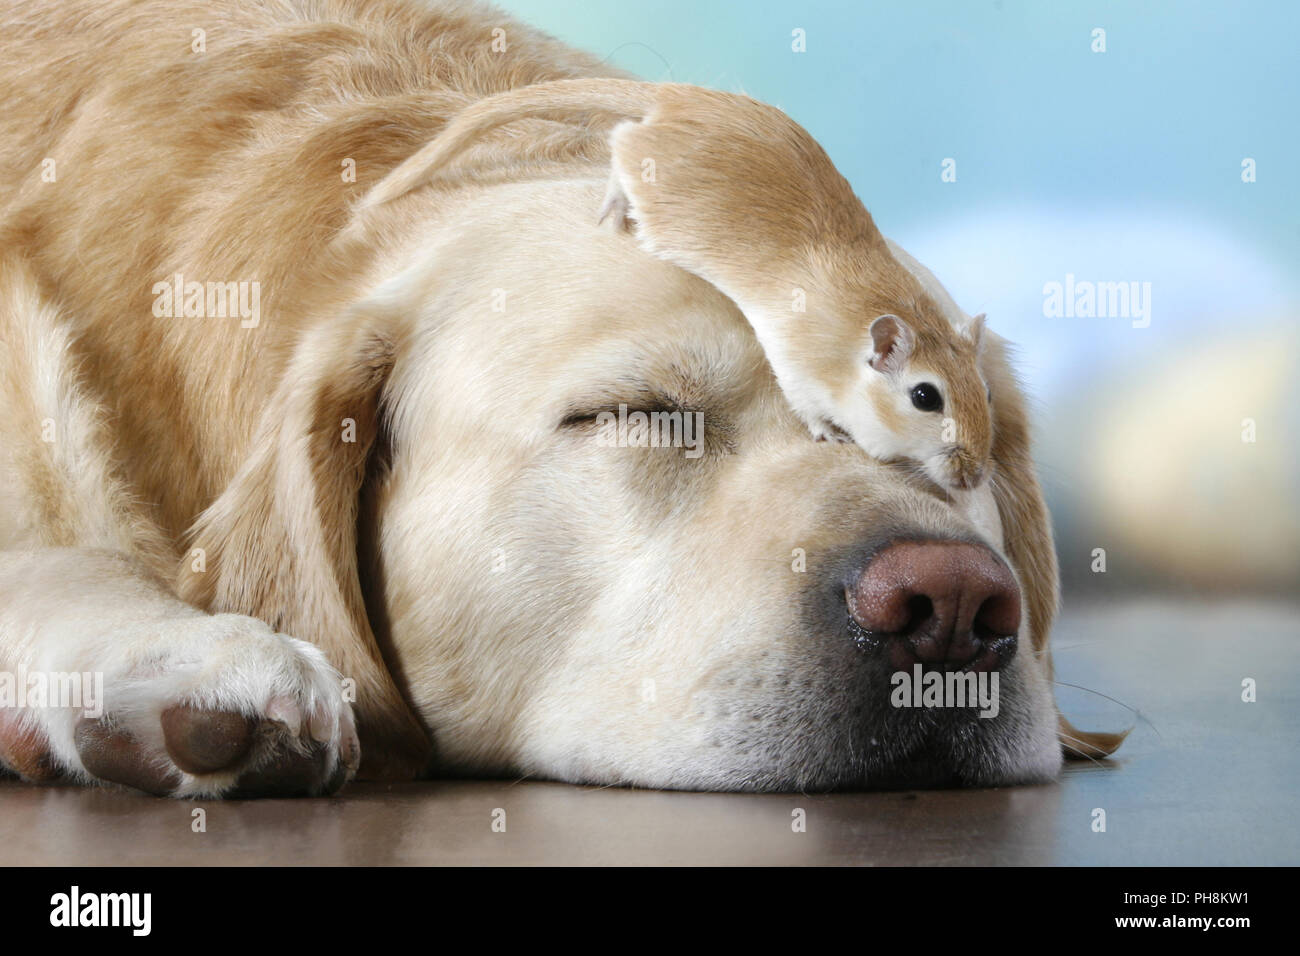 Blonder Labrador, Rennmaus, Labrador Retriever, wüstenrennmaus. Stockbild